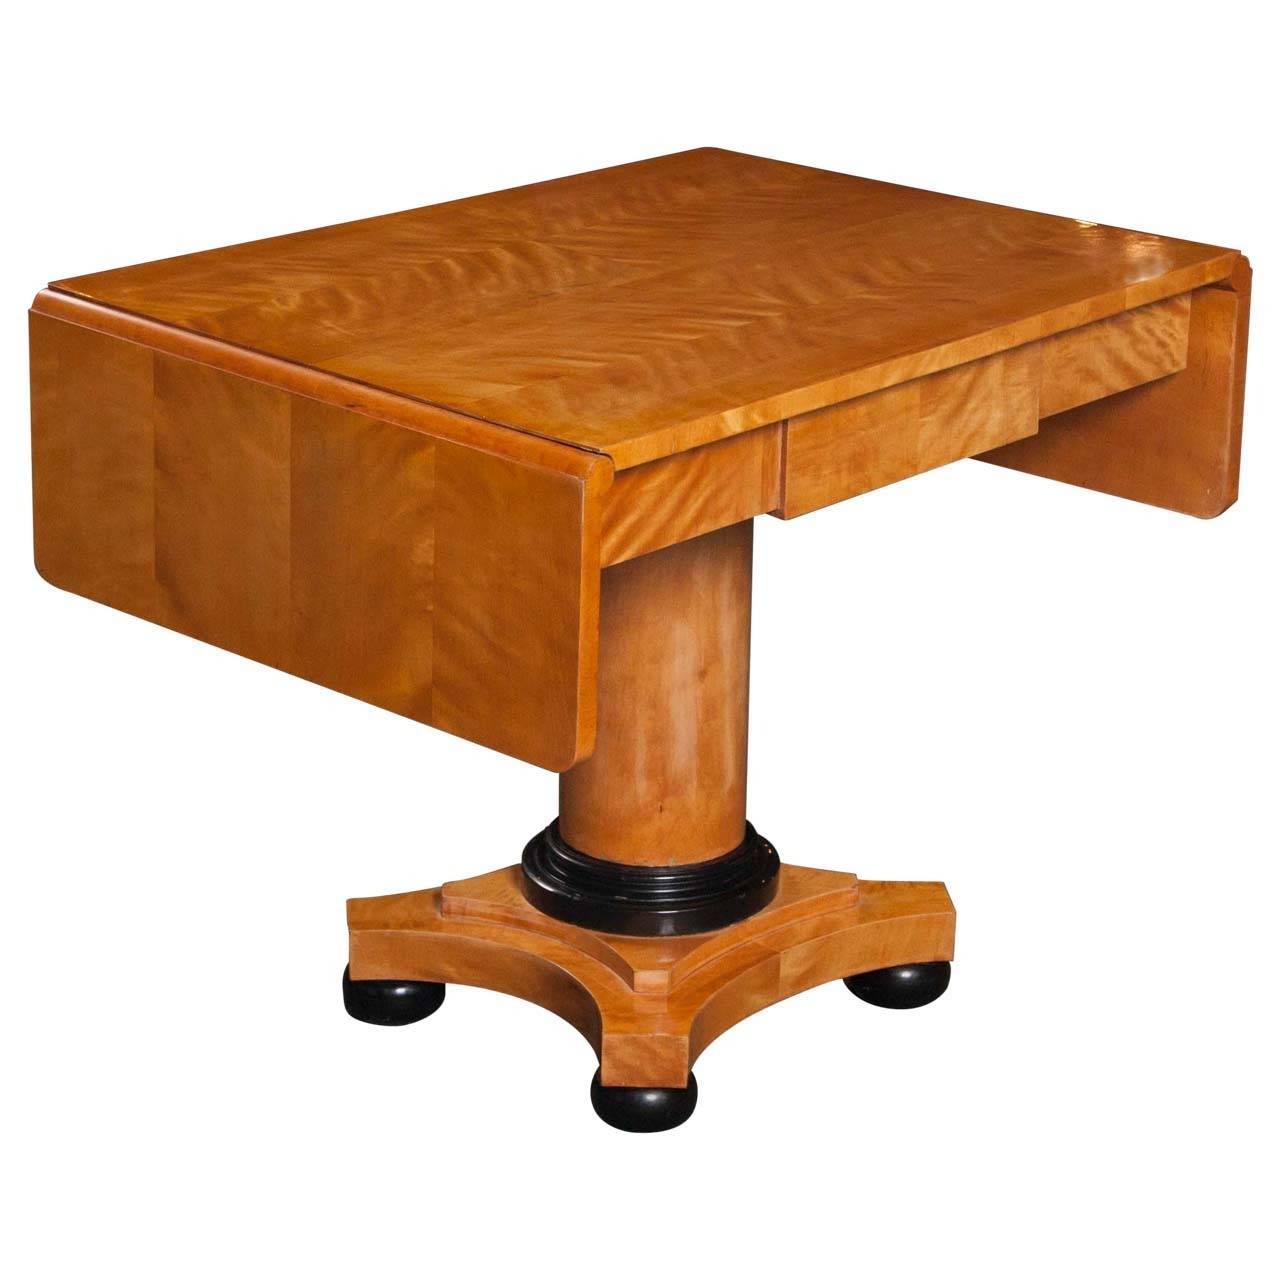 Sofa tables for sale sofa table for sale jinanhongyu for Sofa table sale